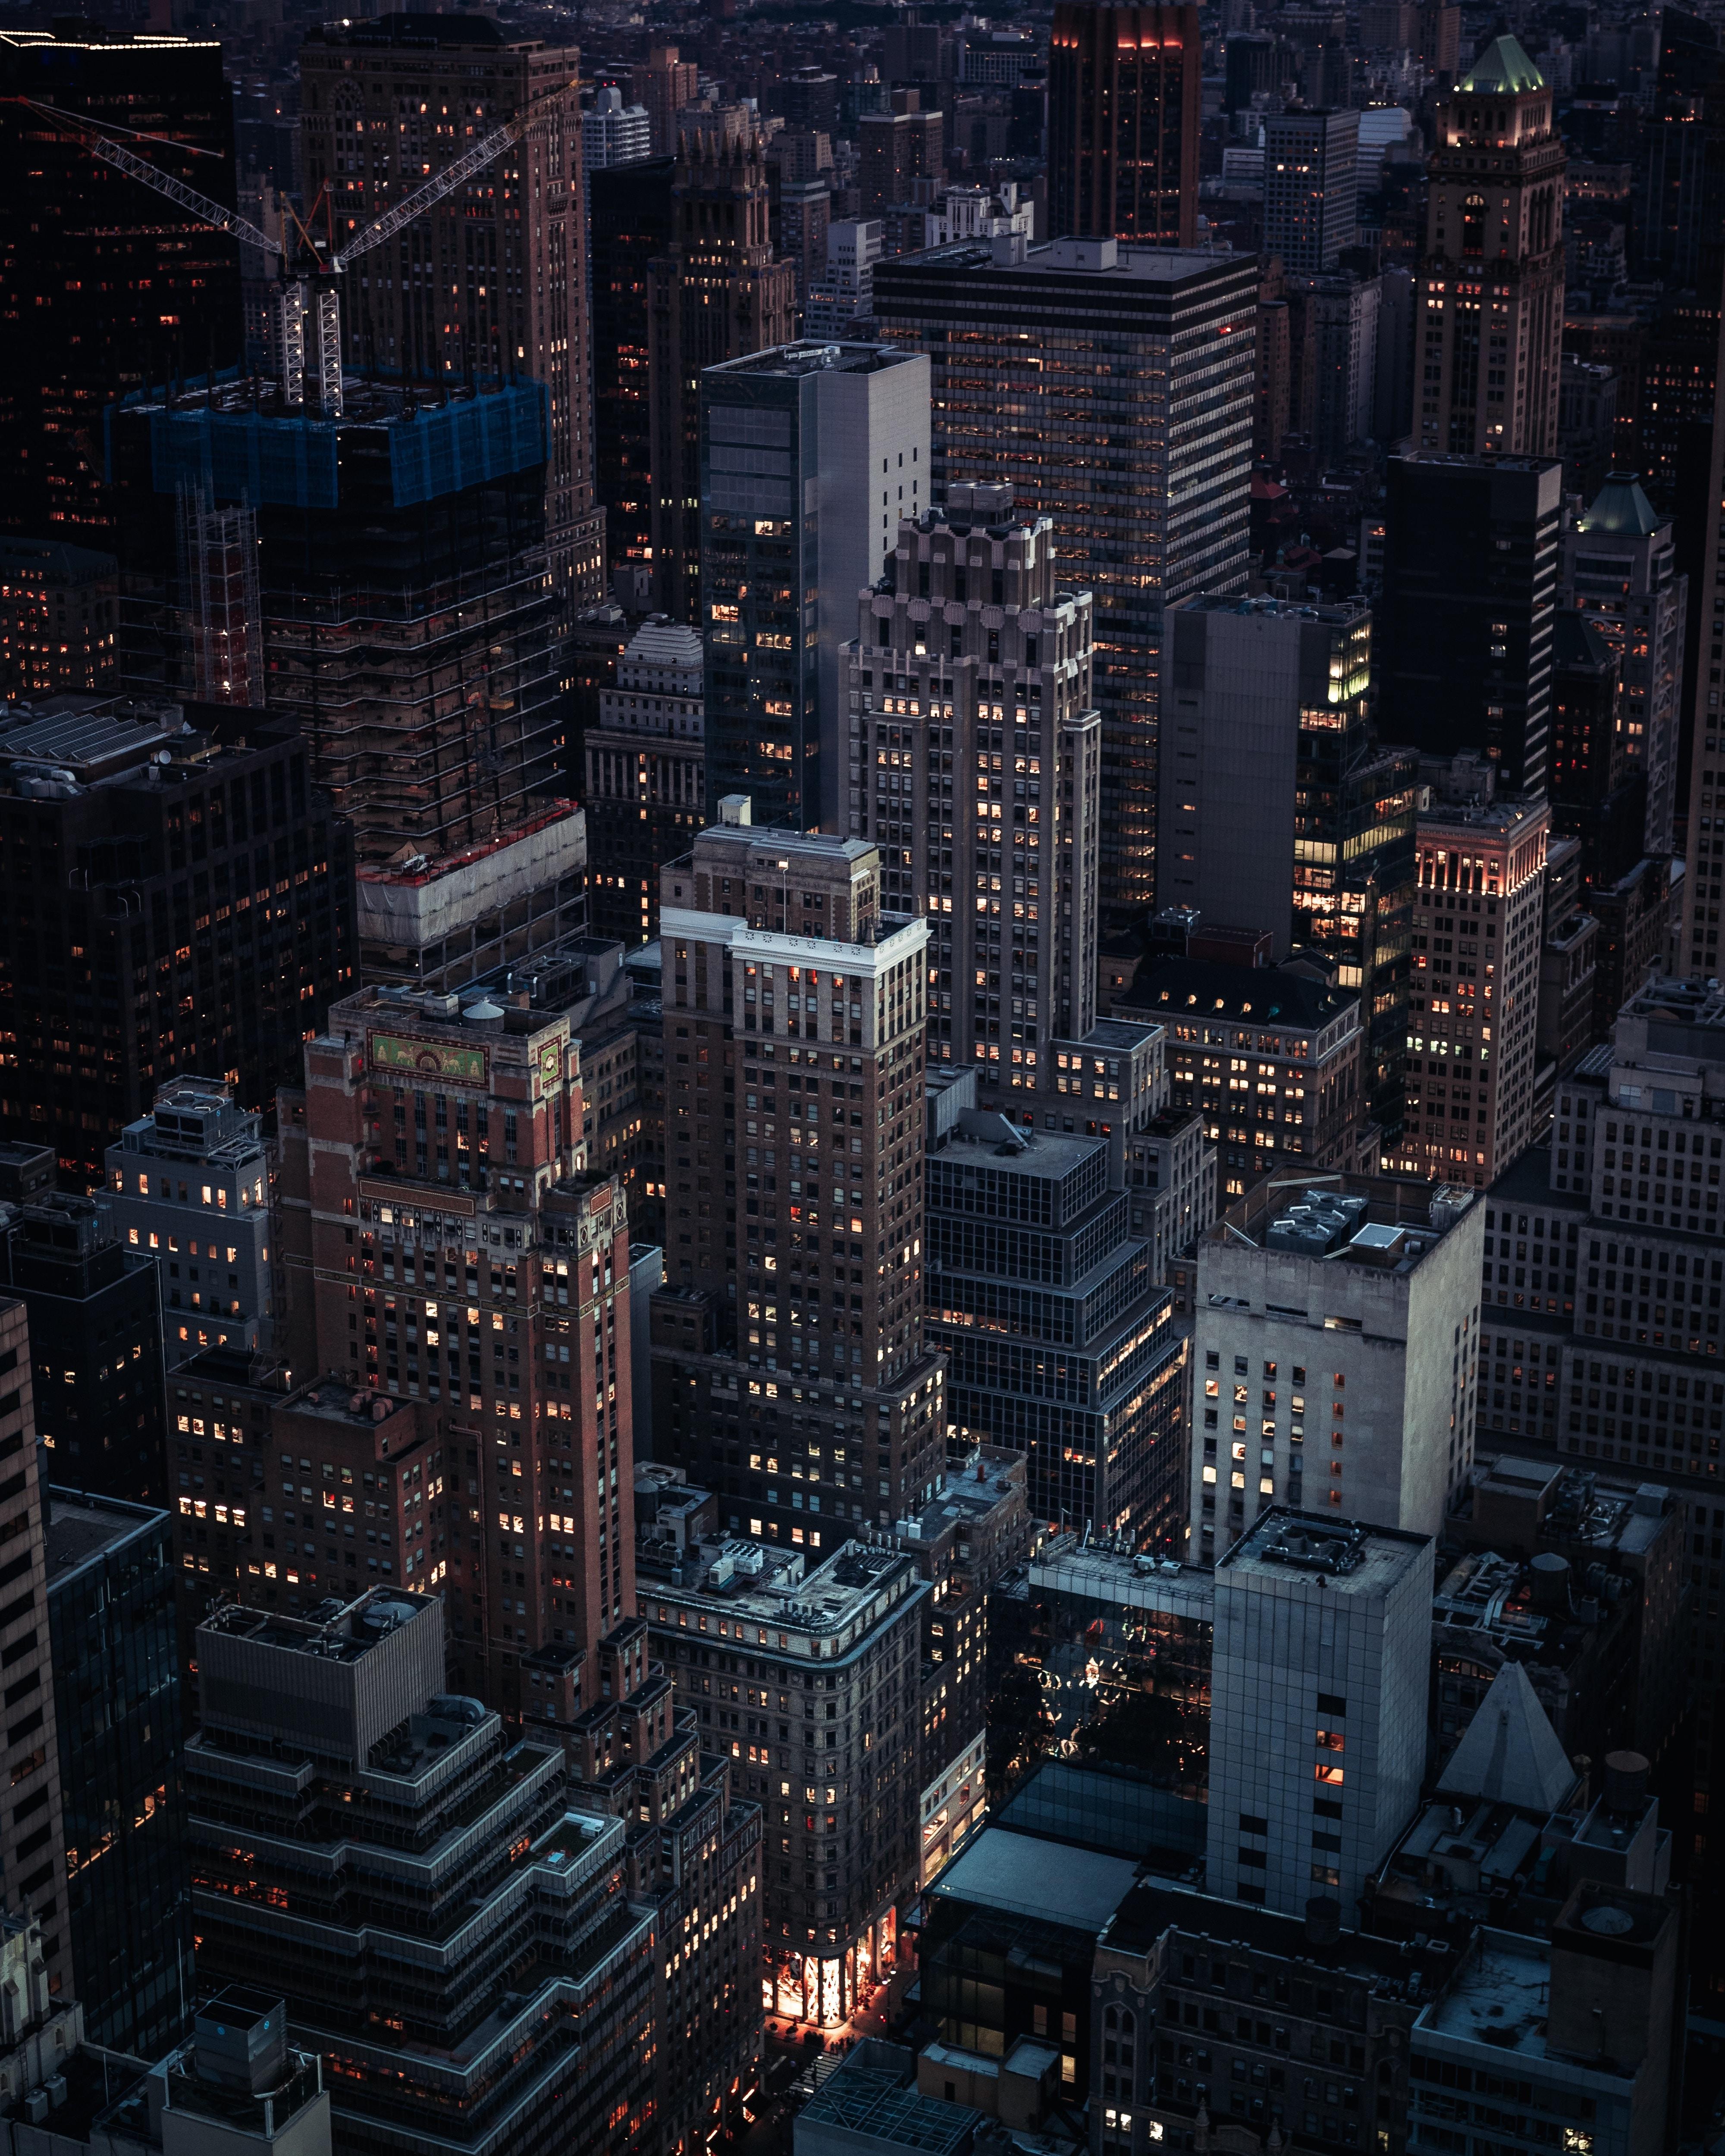 skycraper during nighttime